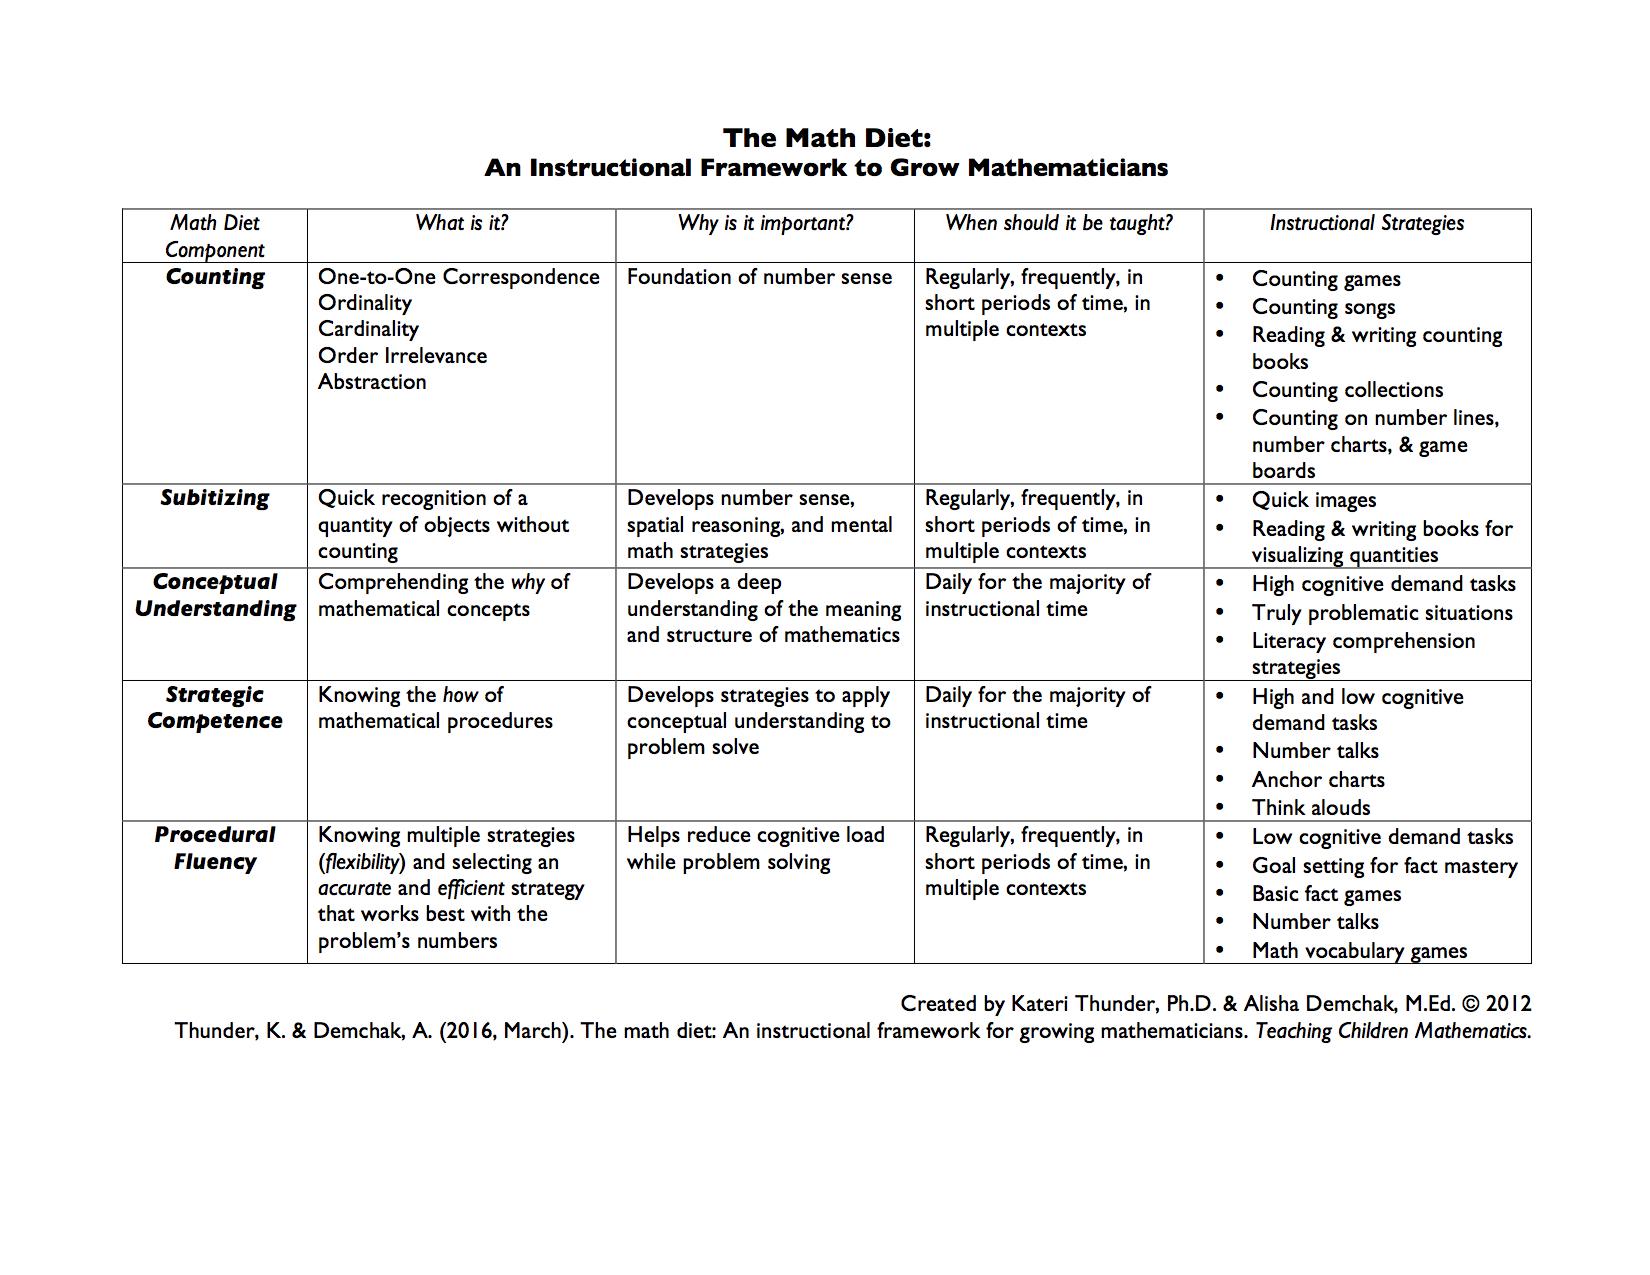 The Math Diet Summary Table